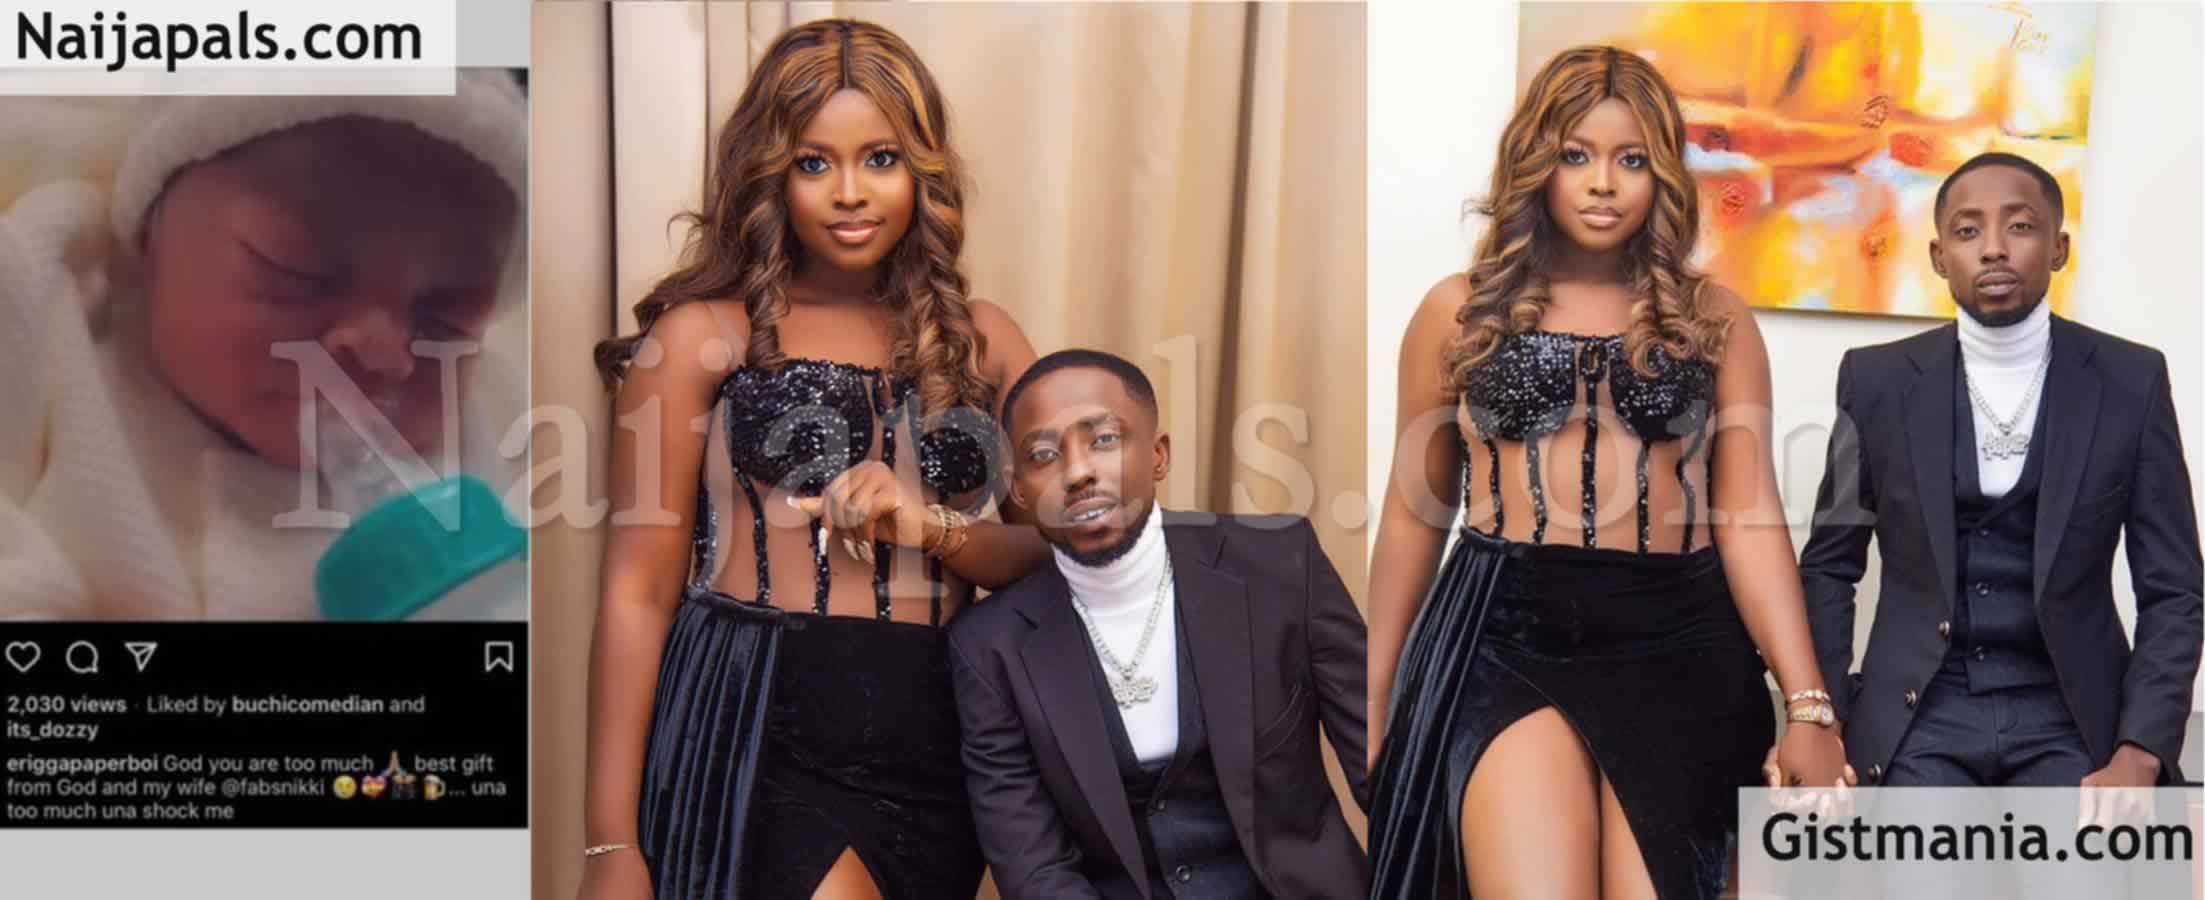 <img alt='.' class='lazyload' data-src='https://img.gistmania.com/emot/photo.png' /> <b>Nigerian Rapper, Erigga & His Beautiful Wife Welcome A Baby Boy</b> (Photo)